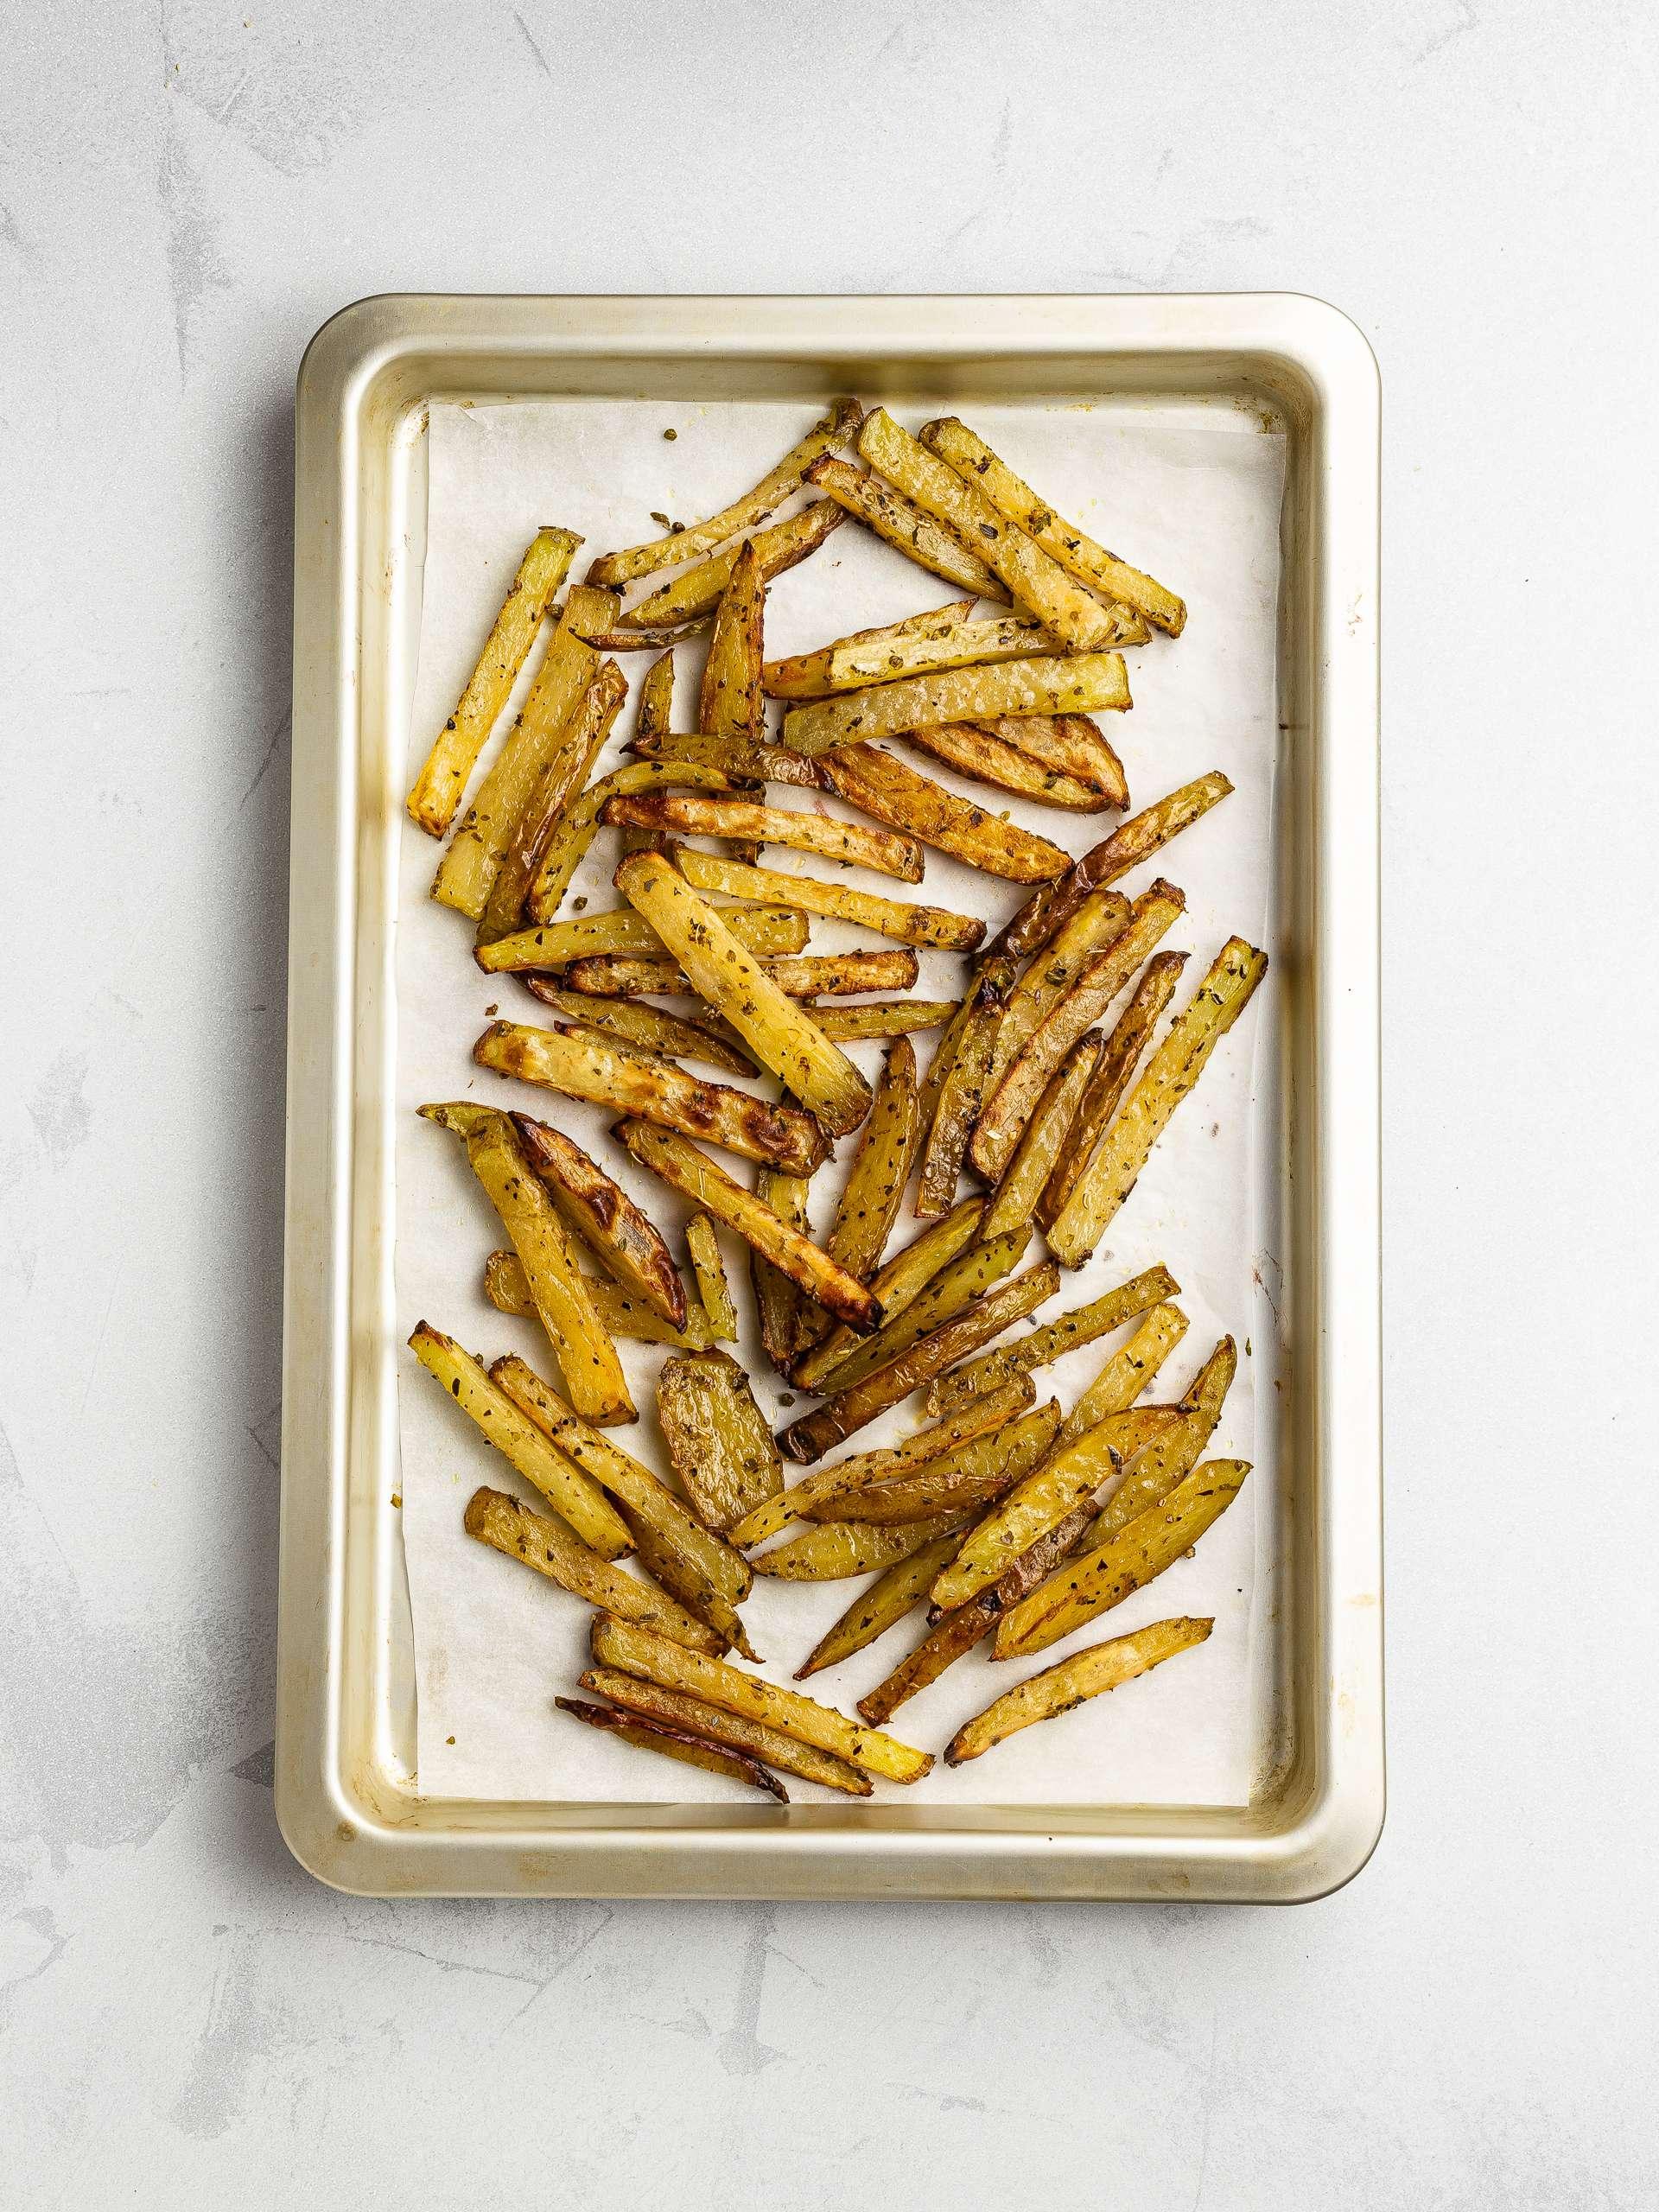 oven baked potato fries